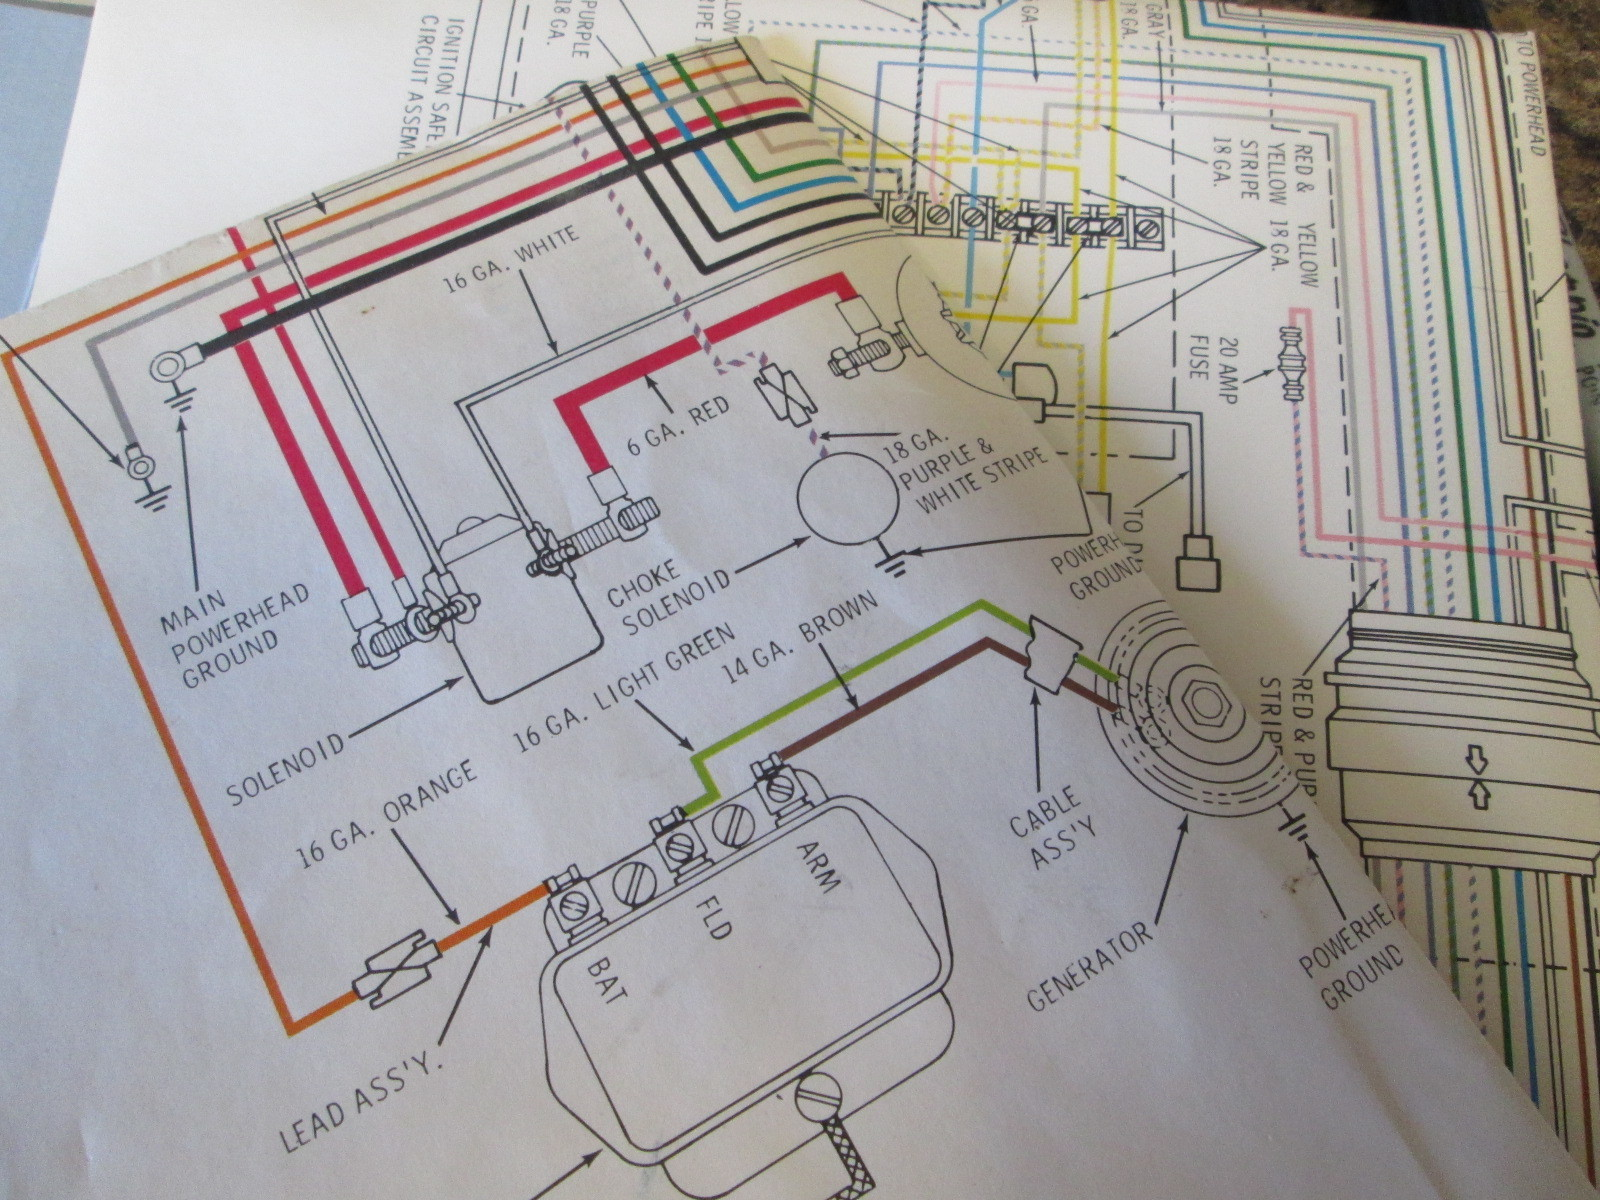 1970 Johnson Outboard Motor Wiring Diagram – Johnson 115 Outboard Wiring Diagram